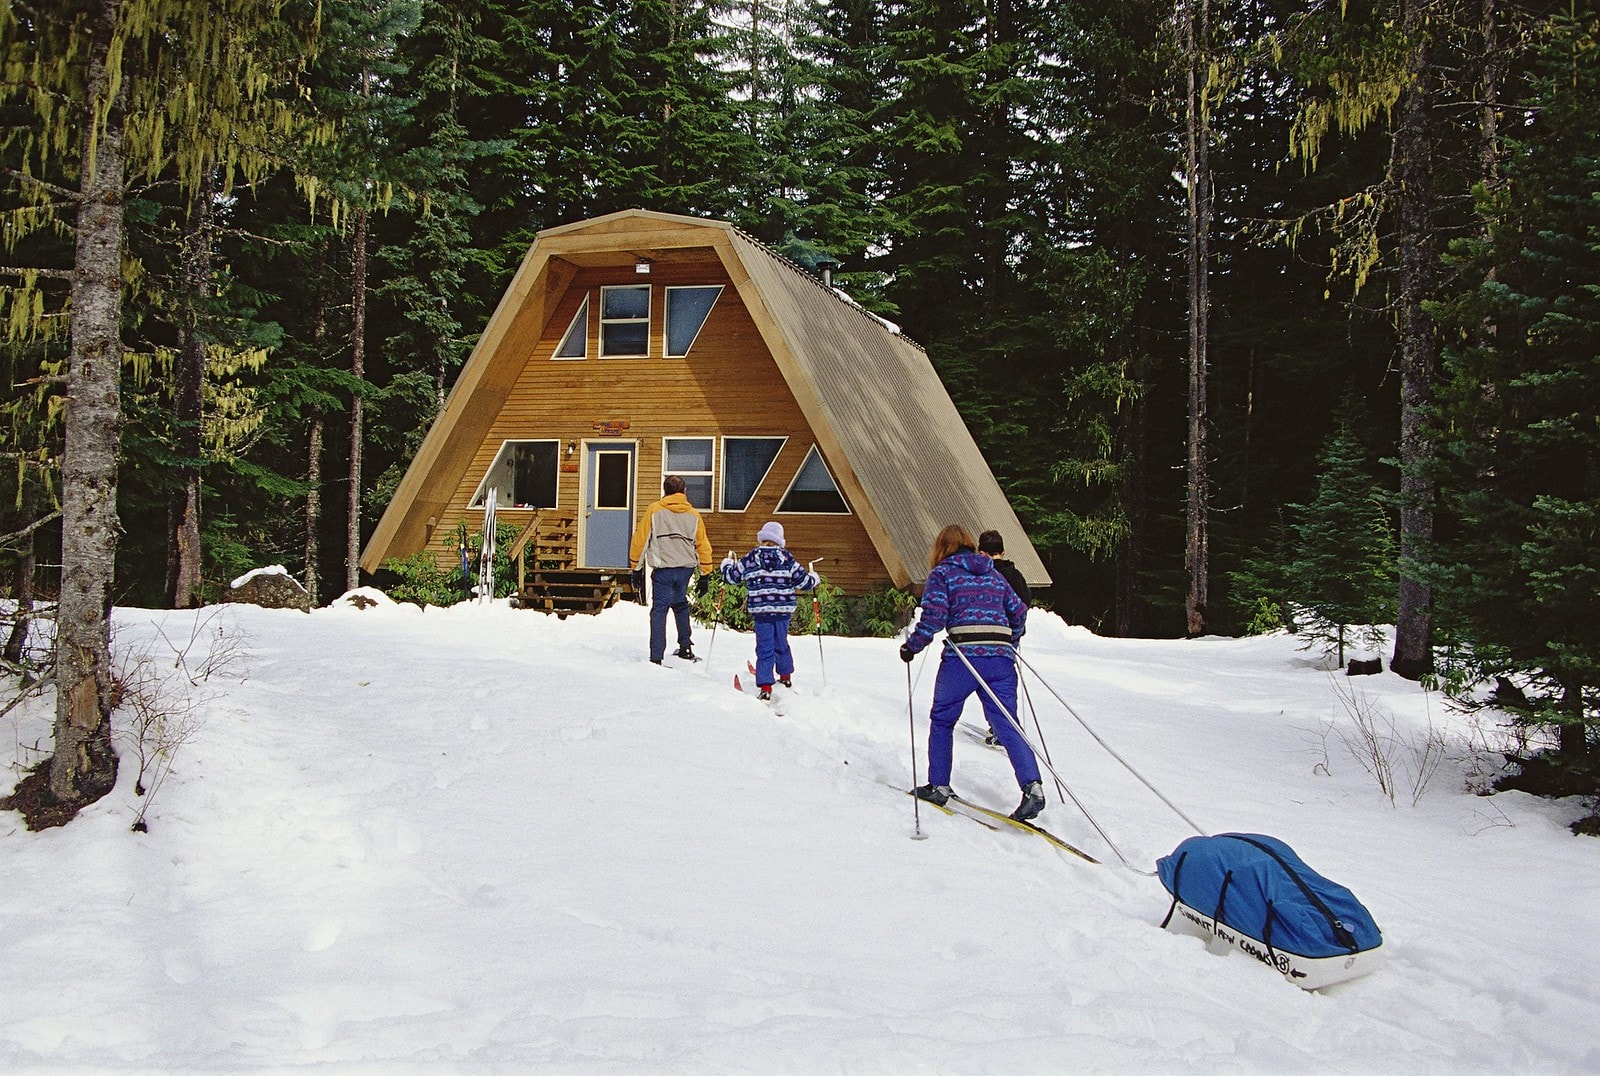 skiers lodging